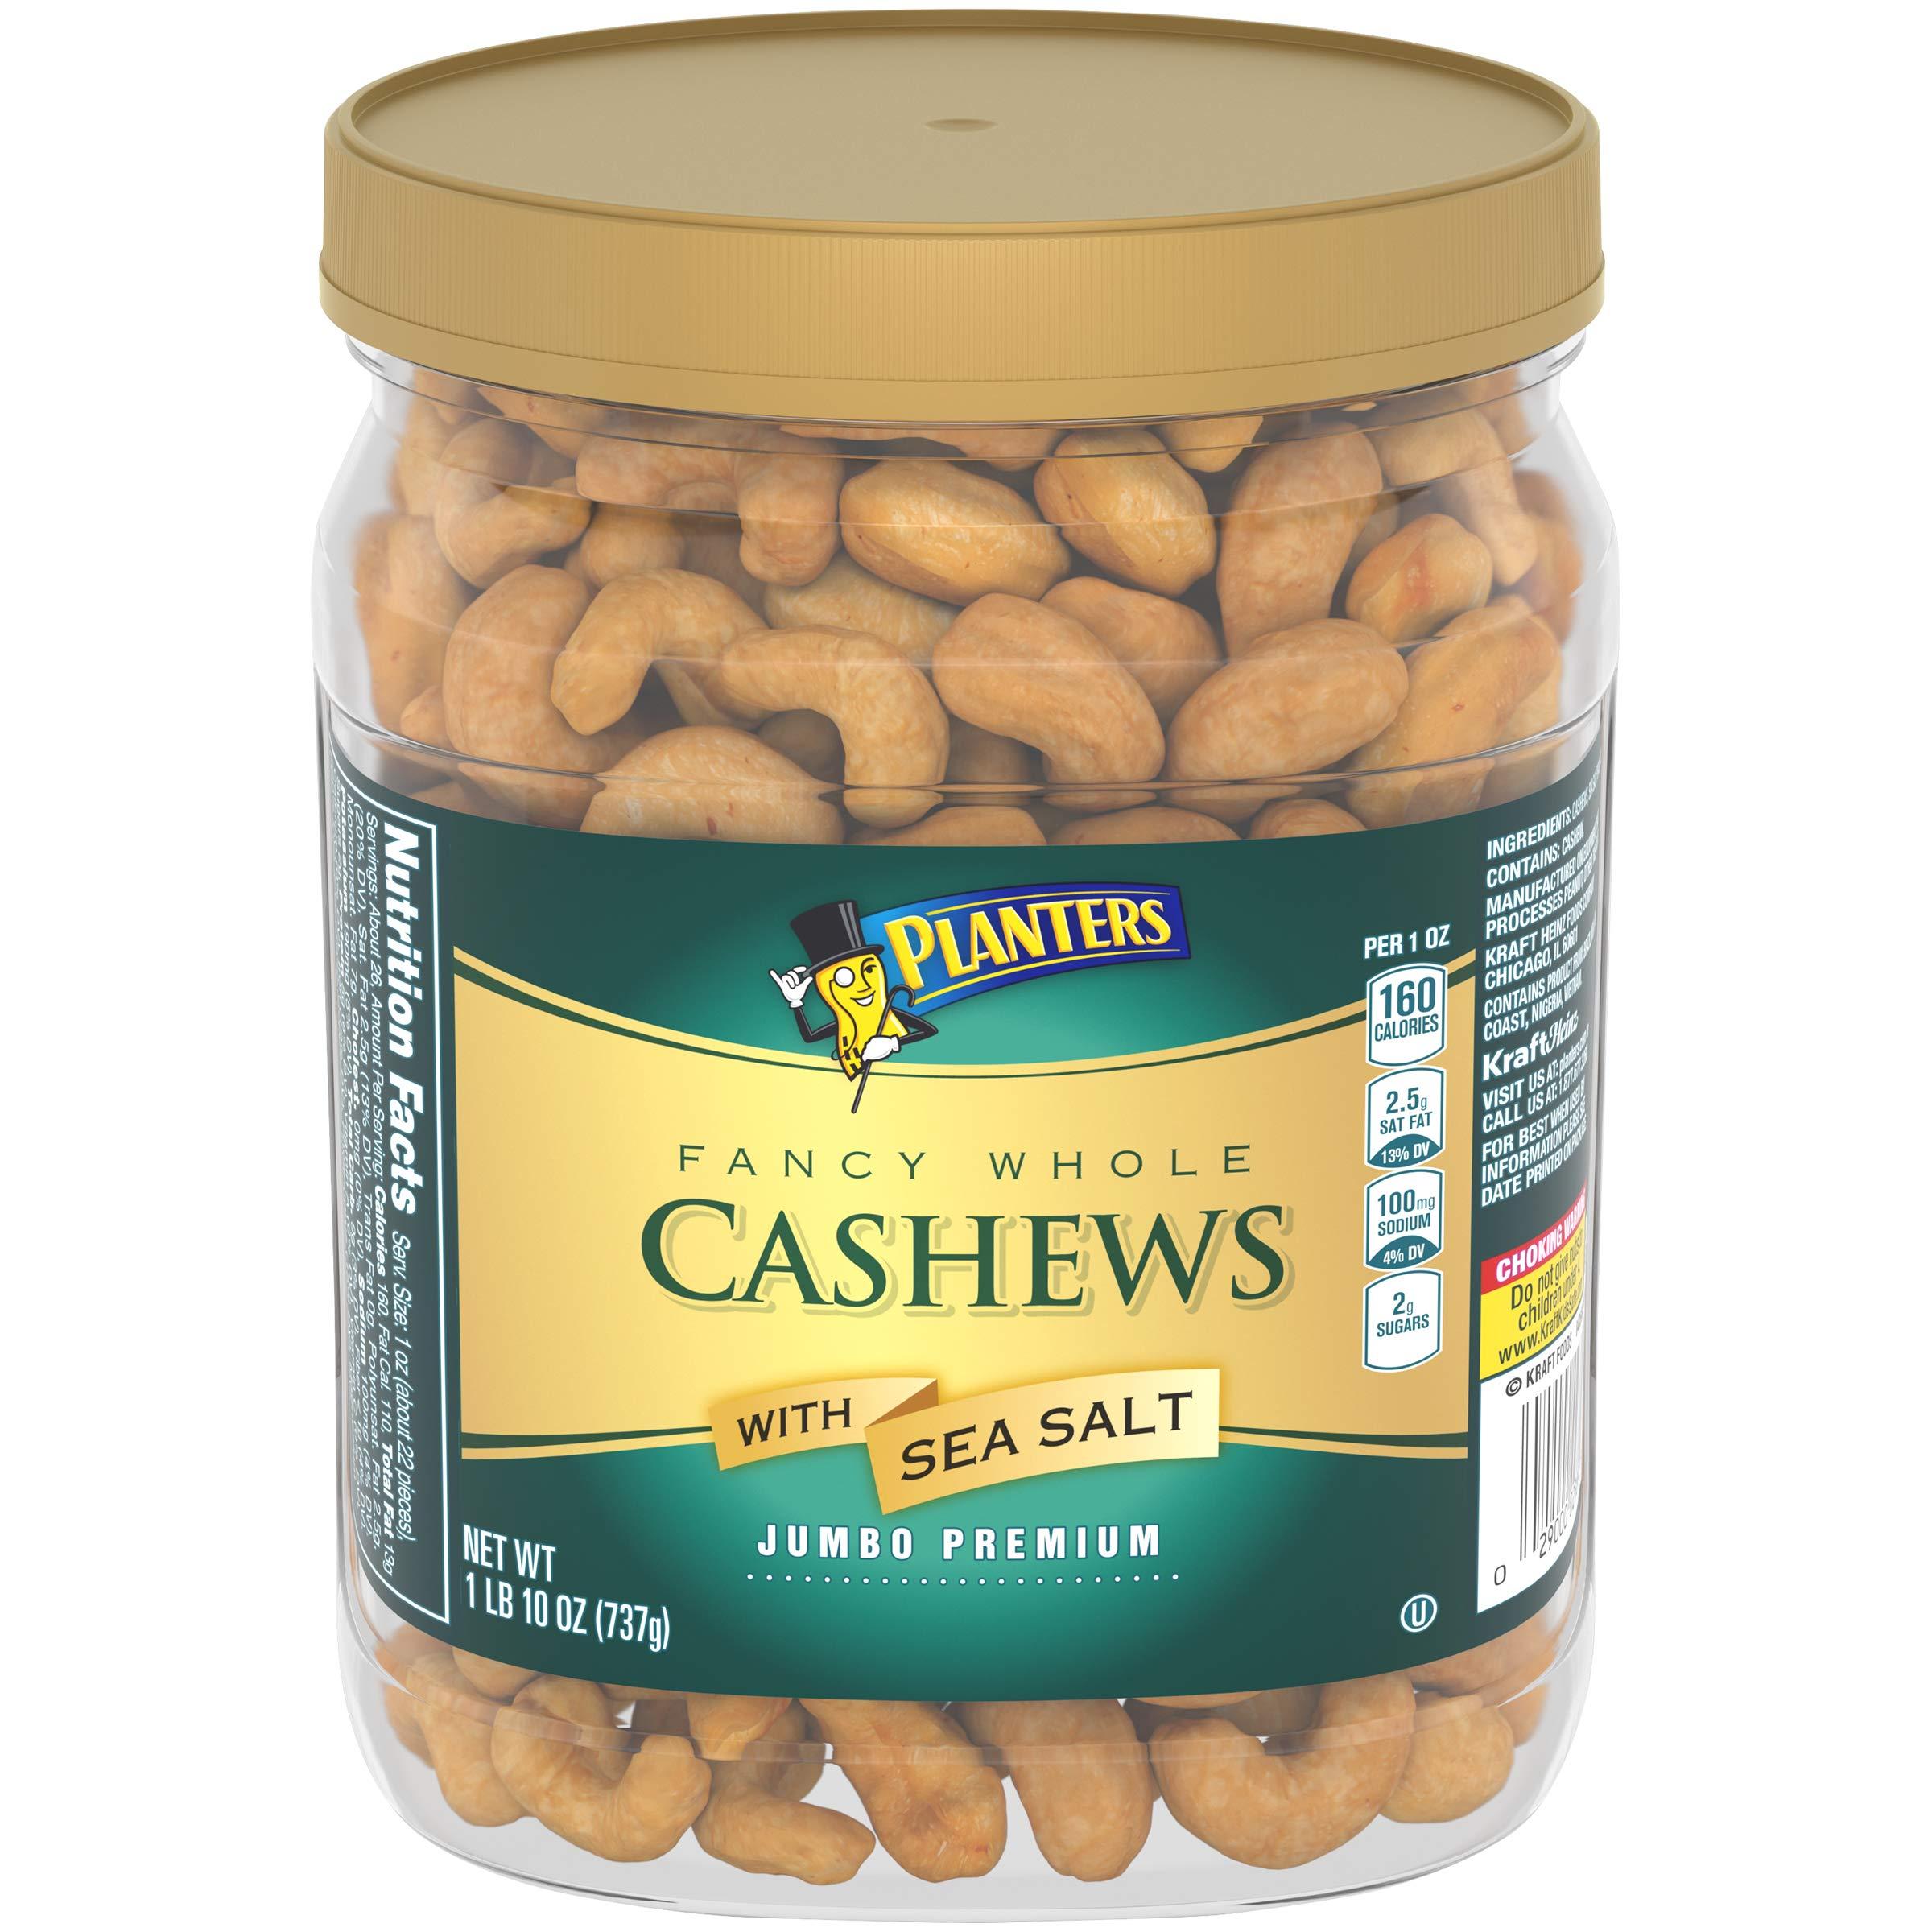 Planters Fancy Whole Cashews With Sea Salt, 26.0 oz Jar by Planters